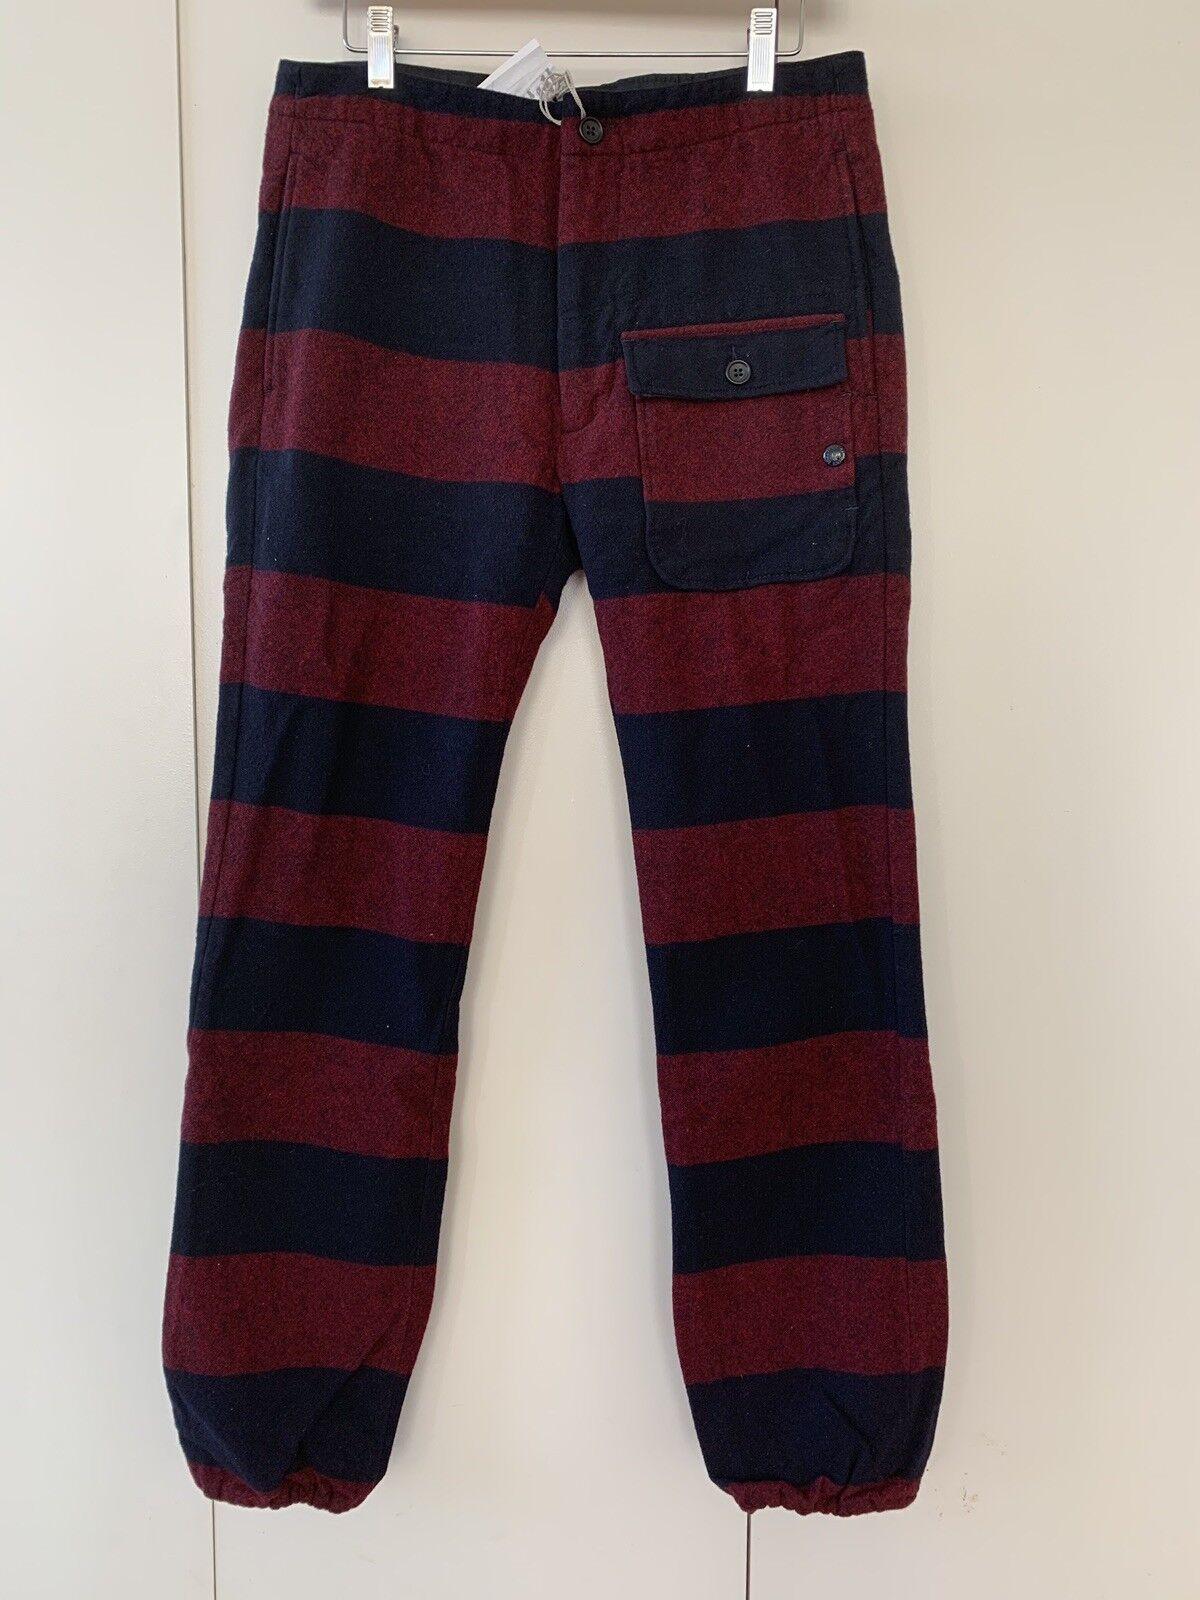 Engineered Garments Fw Wool Pant